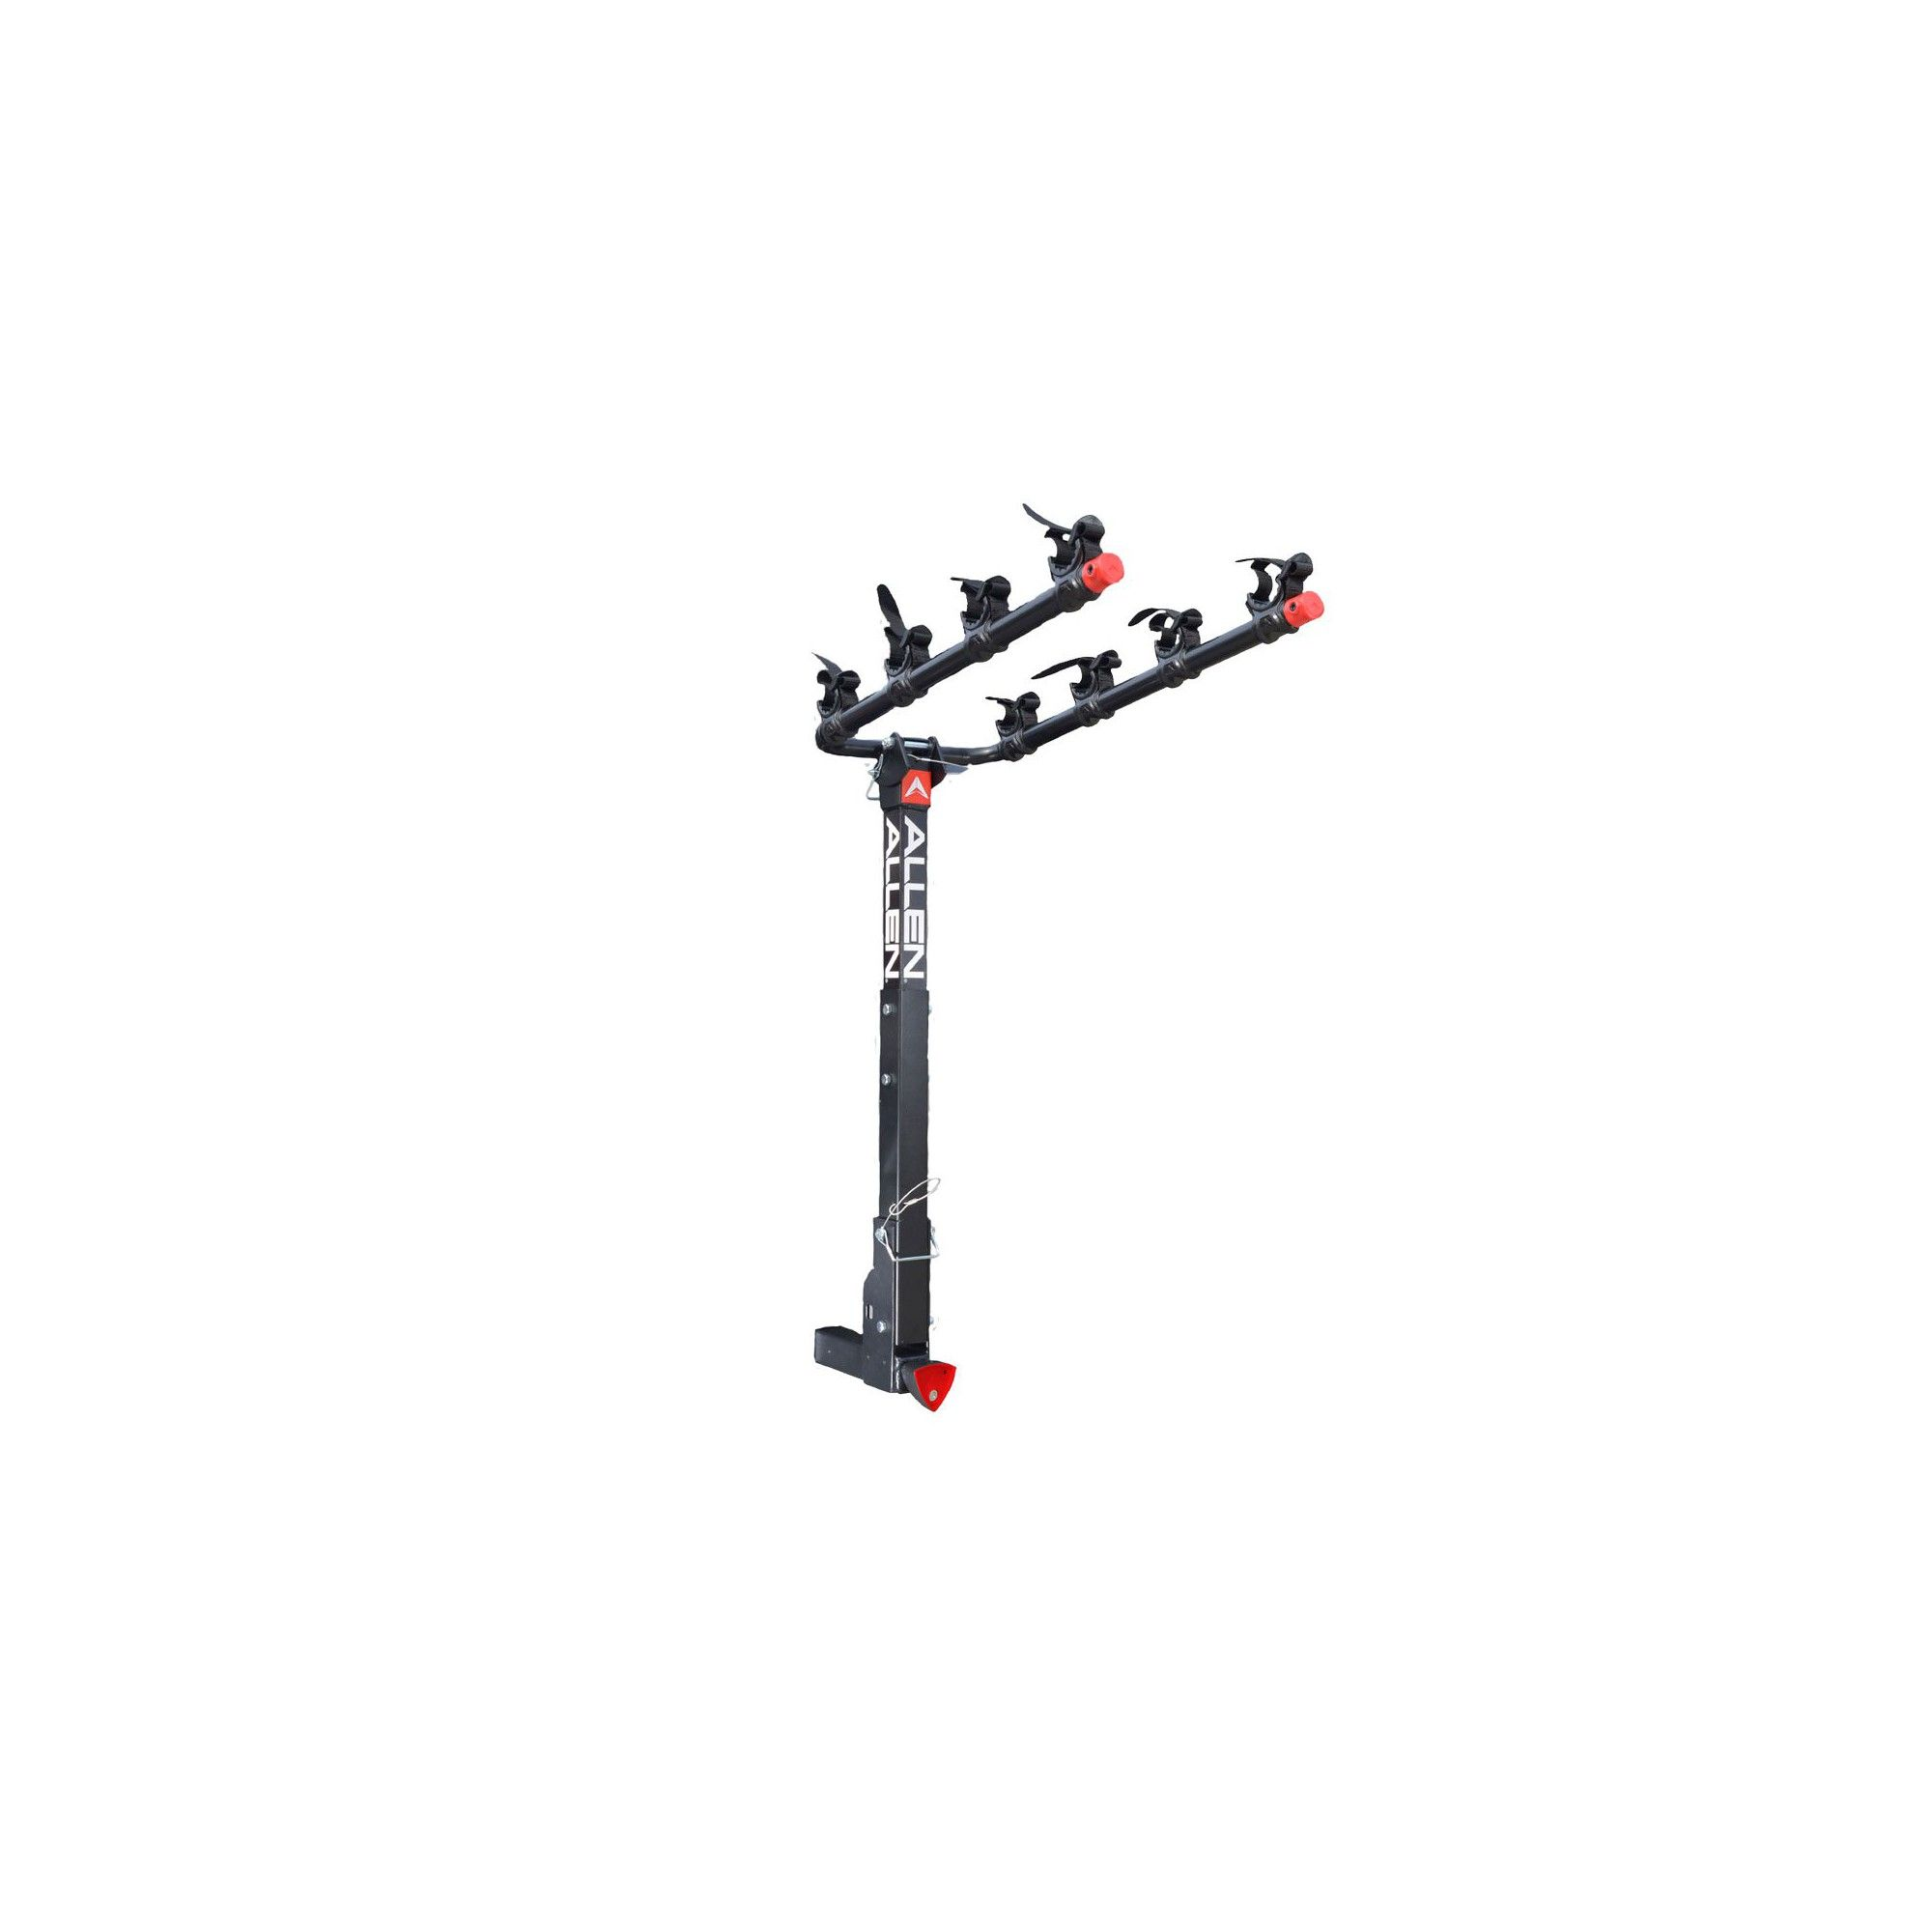 Allen Sports 2 Inch Lockable Hitch Deluxe 4 Bike Rack With